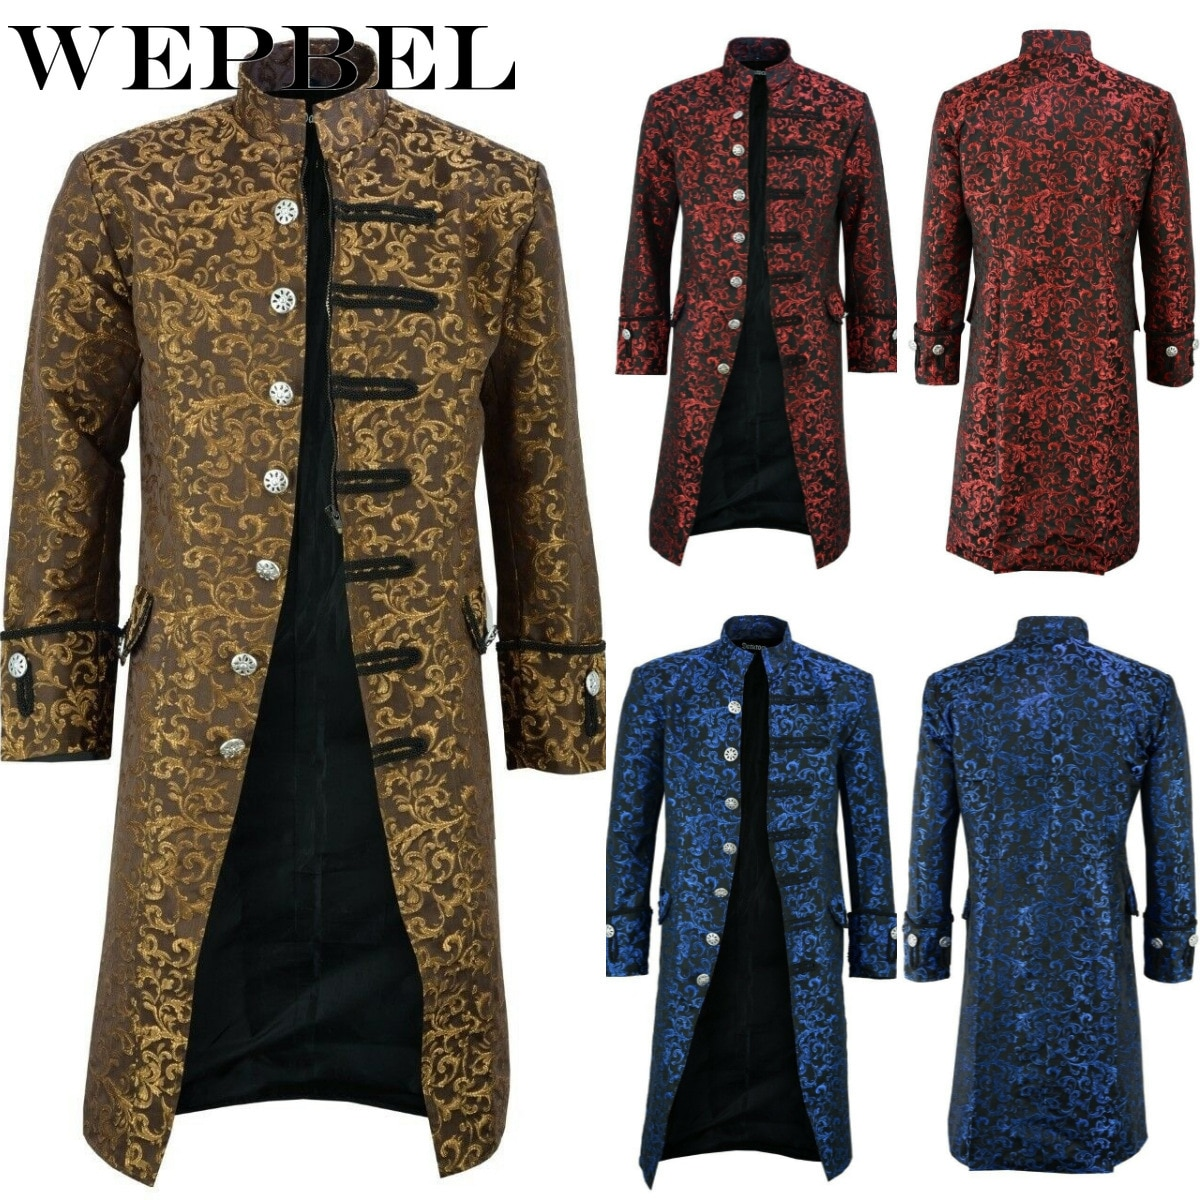 Wepbel casaco longo masculino de manga longa, floral, vintage, steam, punk, vitoriano, casacos masculinos